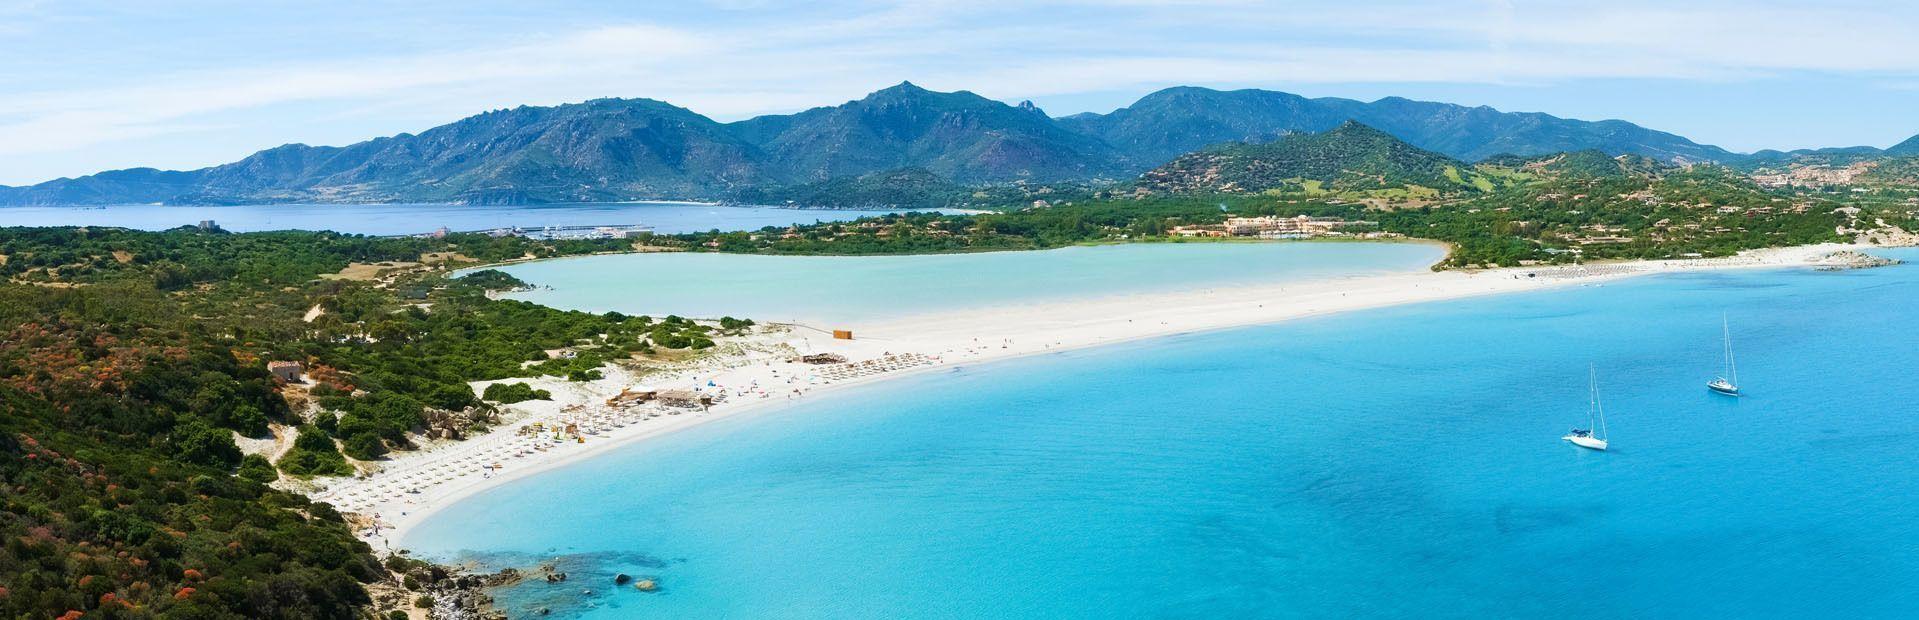 Sardegna Sud: beach life da Villasimius al Pan di Zucchero